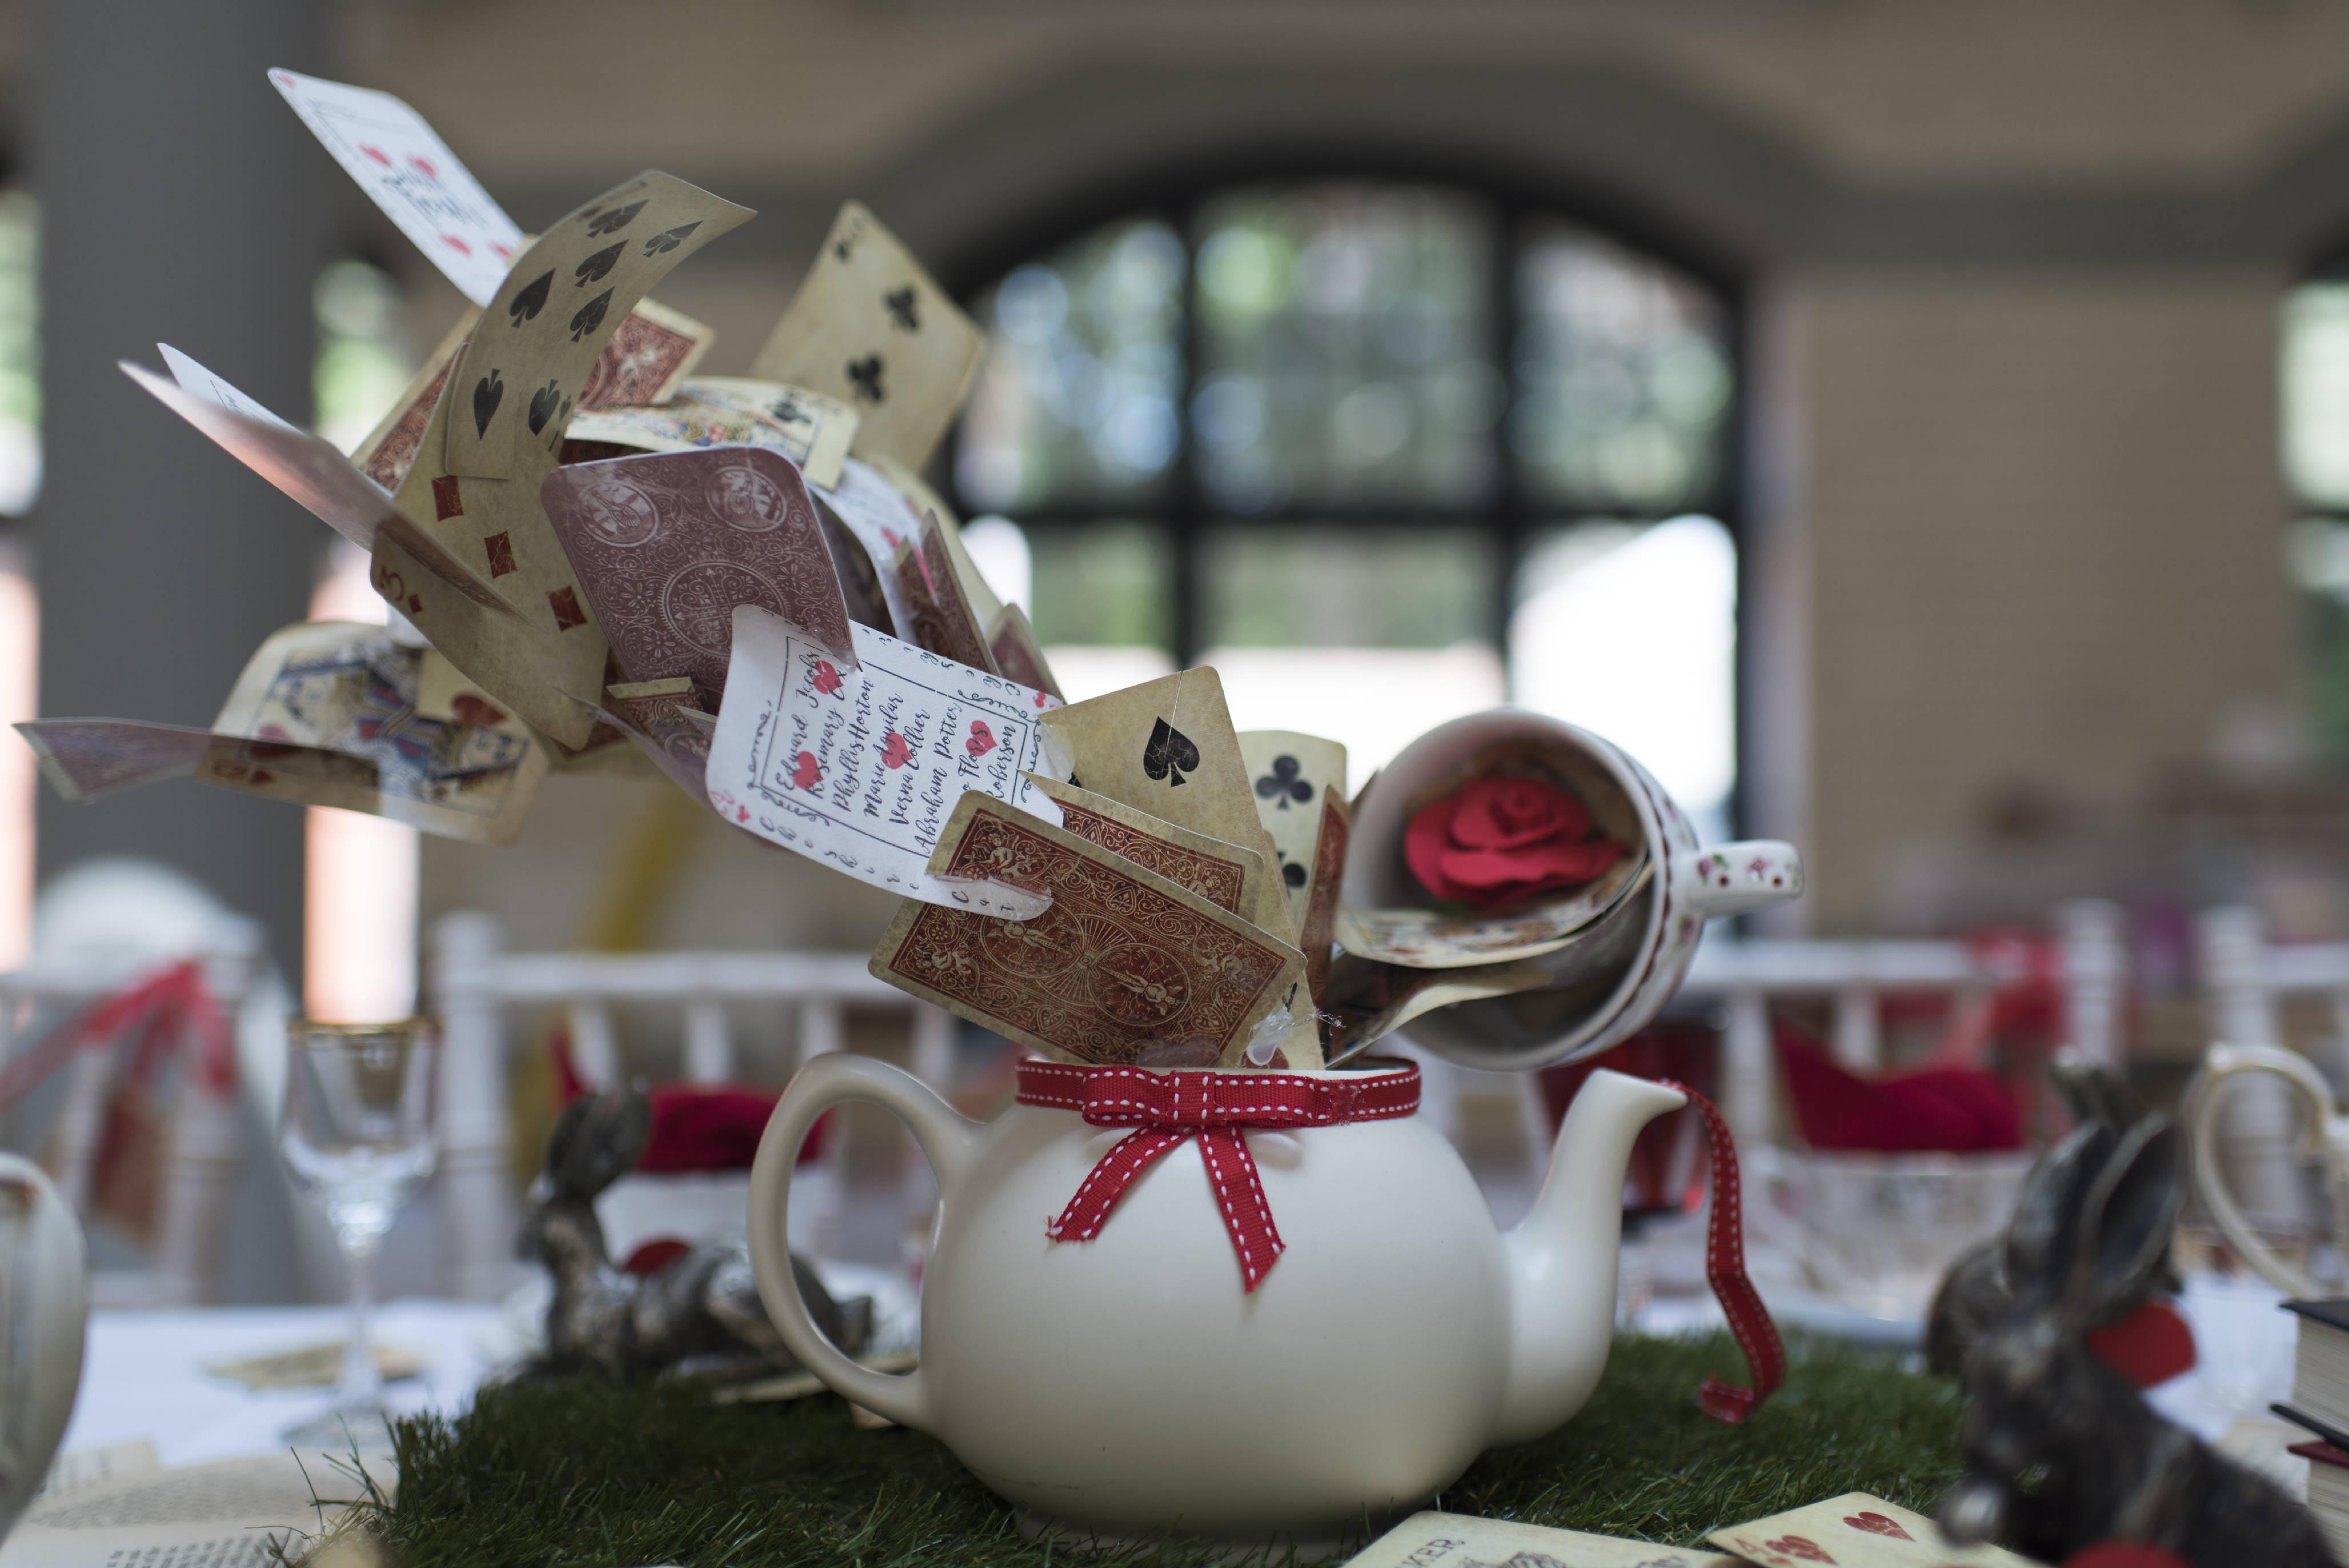 wedding planner - alternative and unconventional wedding - alice in wonderland table centrepiece